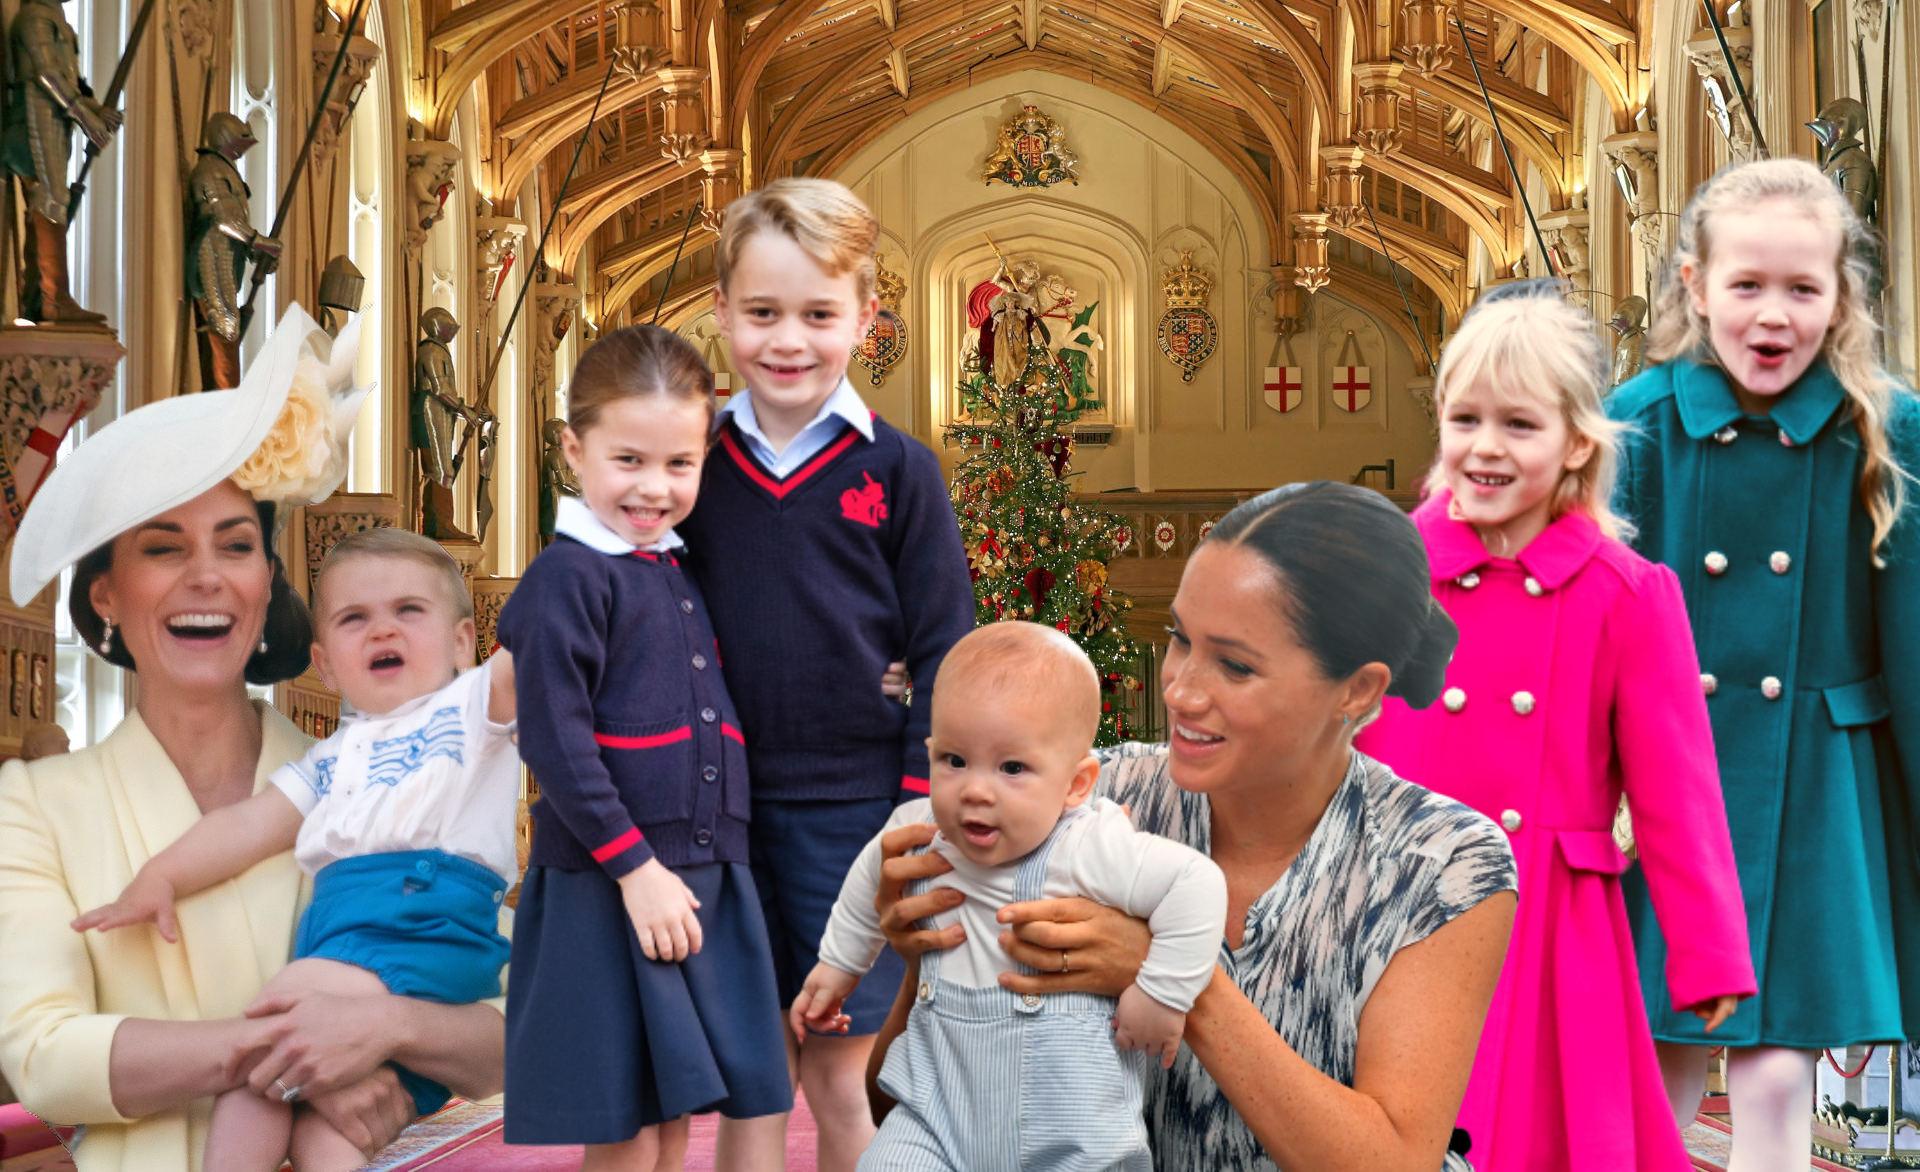 Karališkoji šeima liekna Karališkoji Monako šeima laukia pagausėjimo